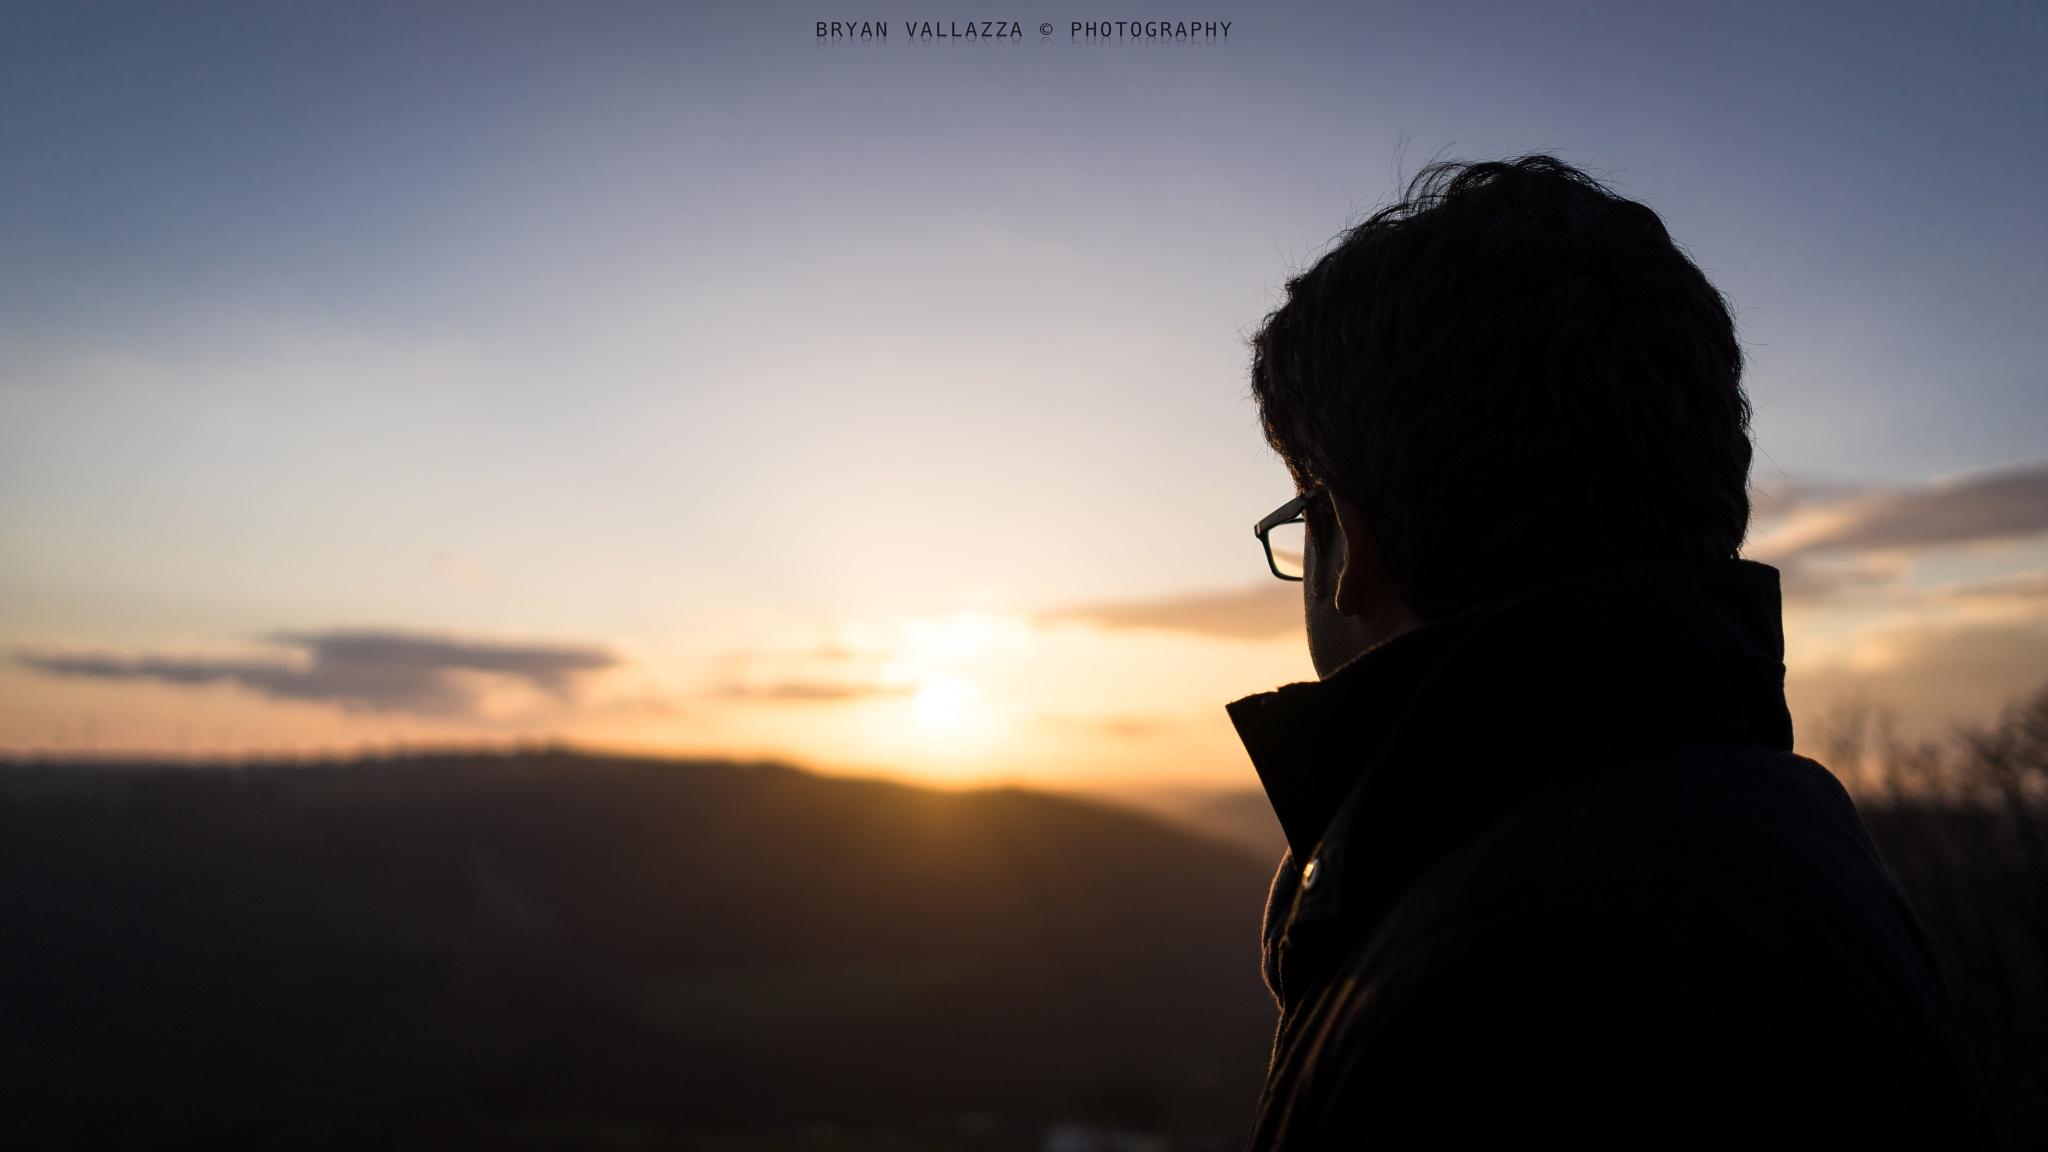 Sunset by bryanvallazza